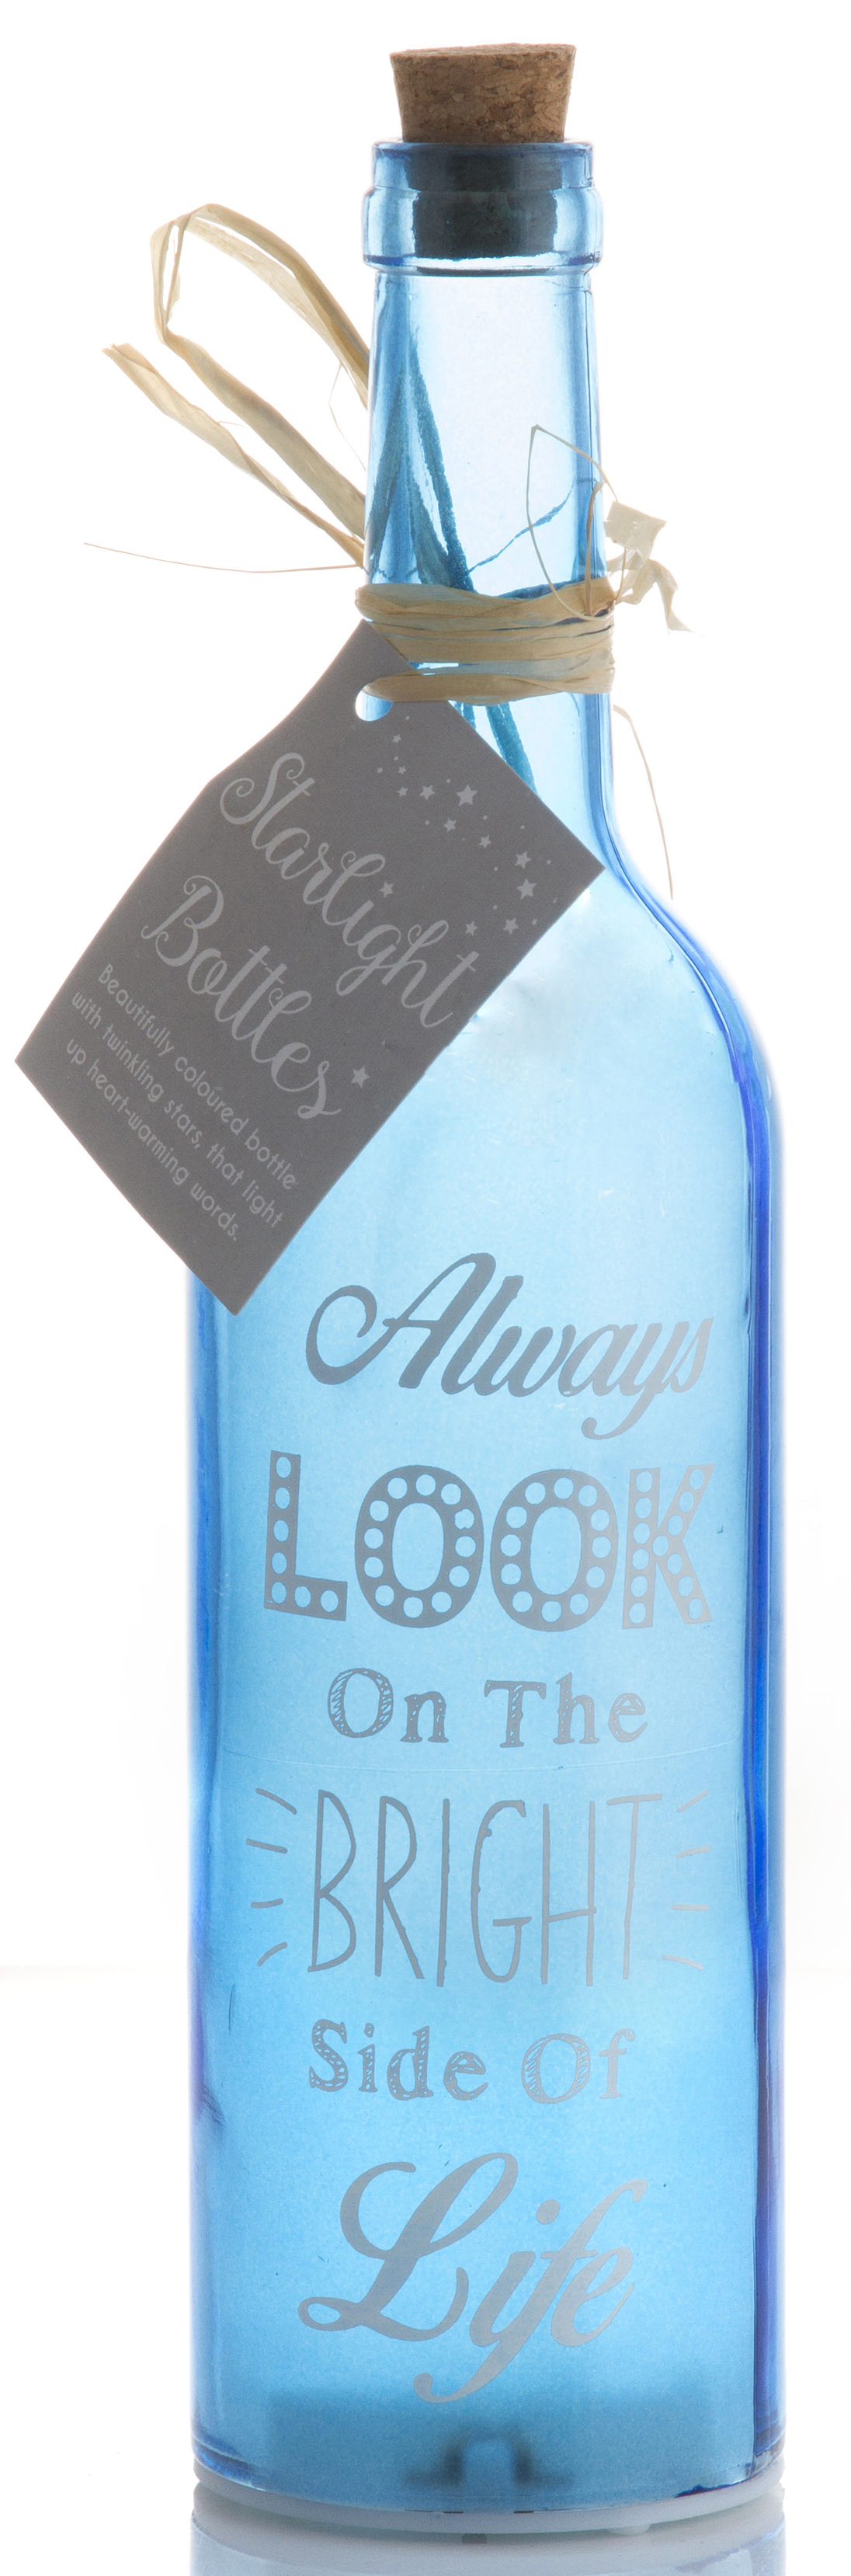 Bright Side of Life Starlight Bottle